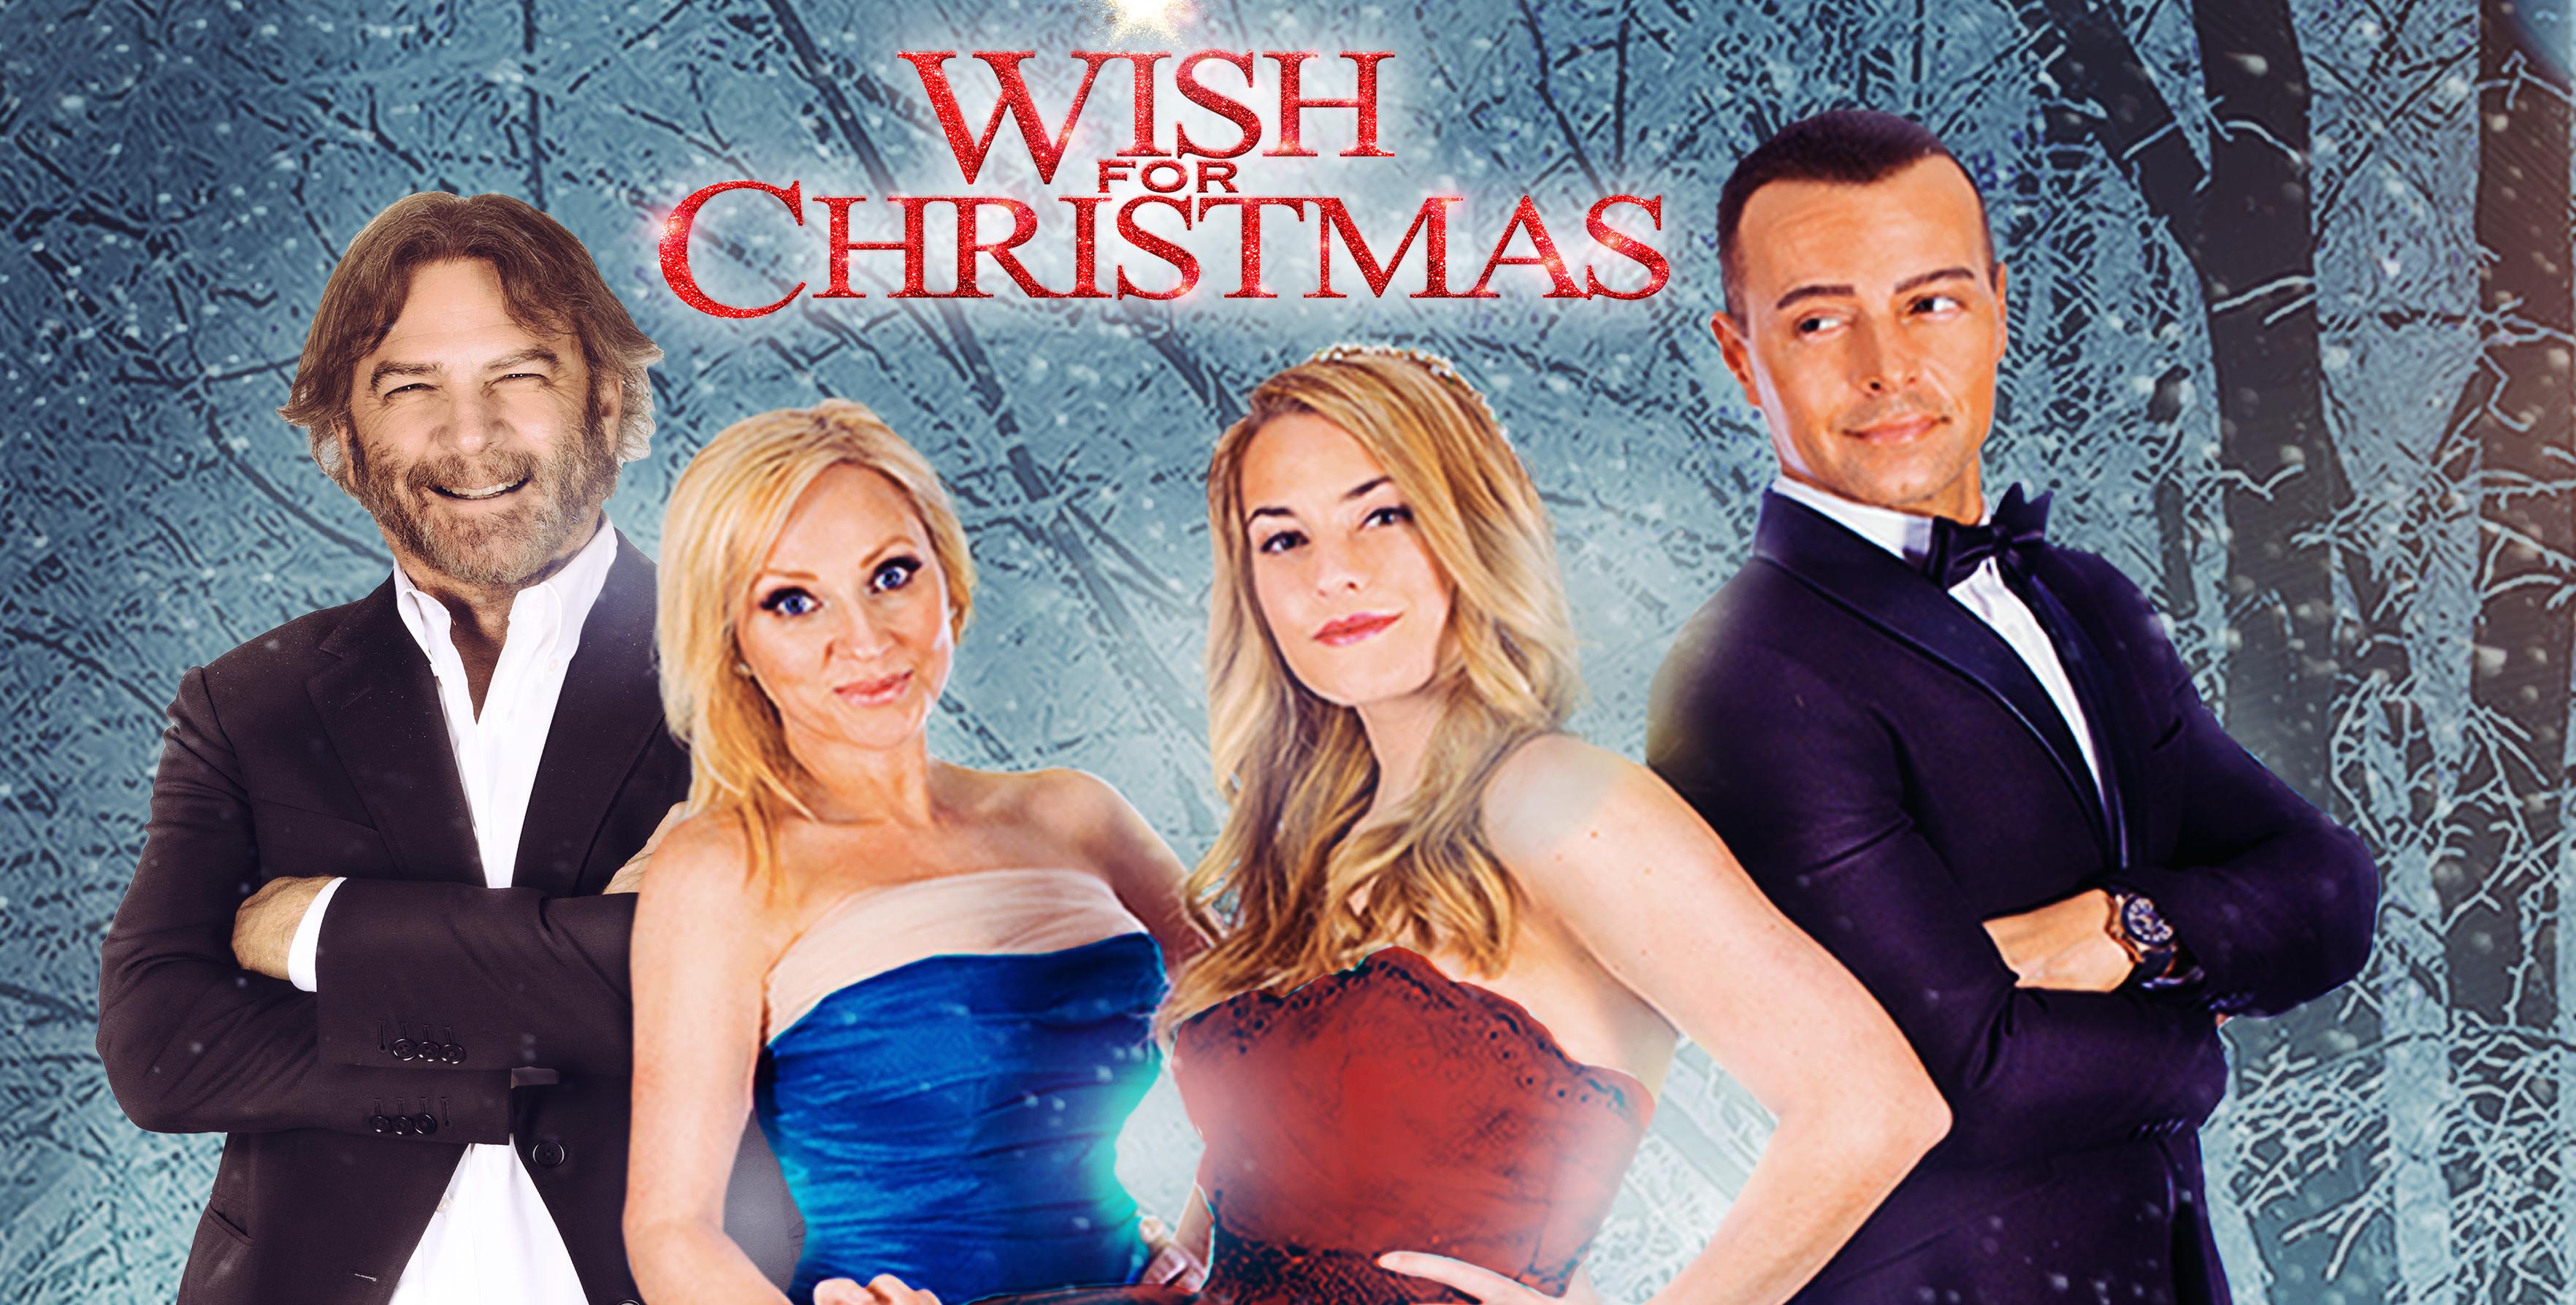 Wish For Christmas.Wish For Christmas Pure Flix